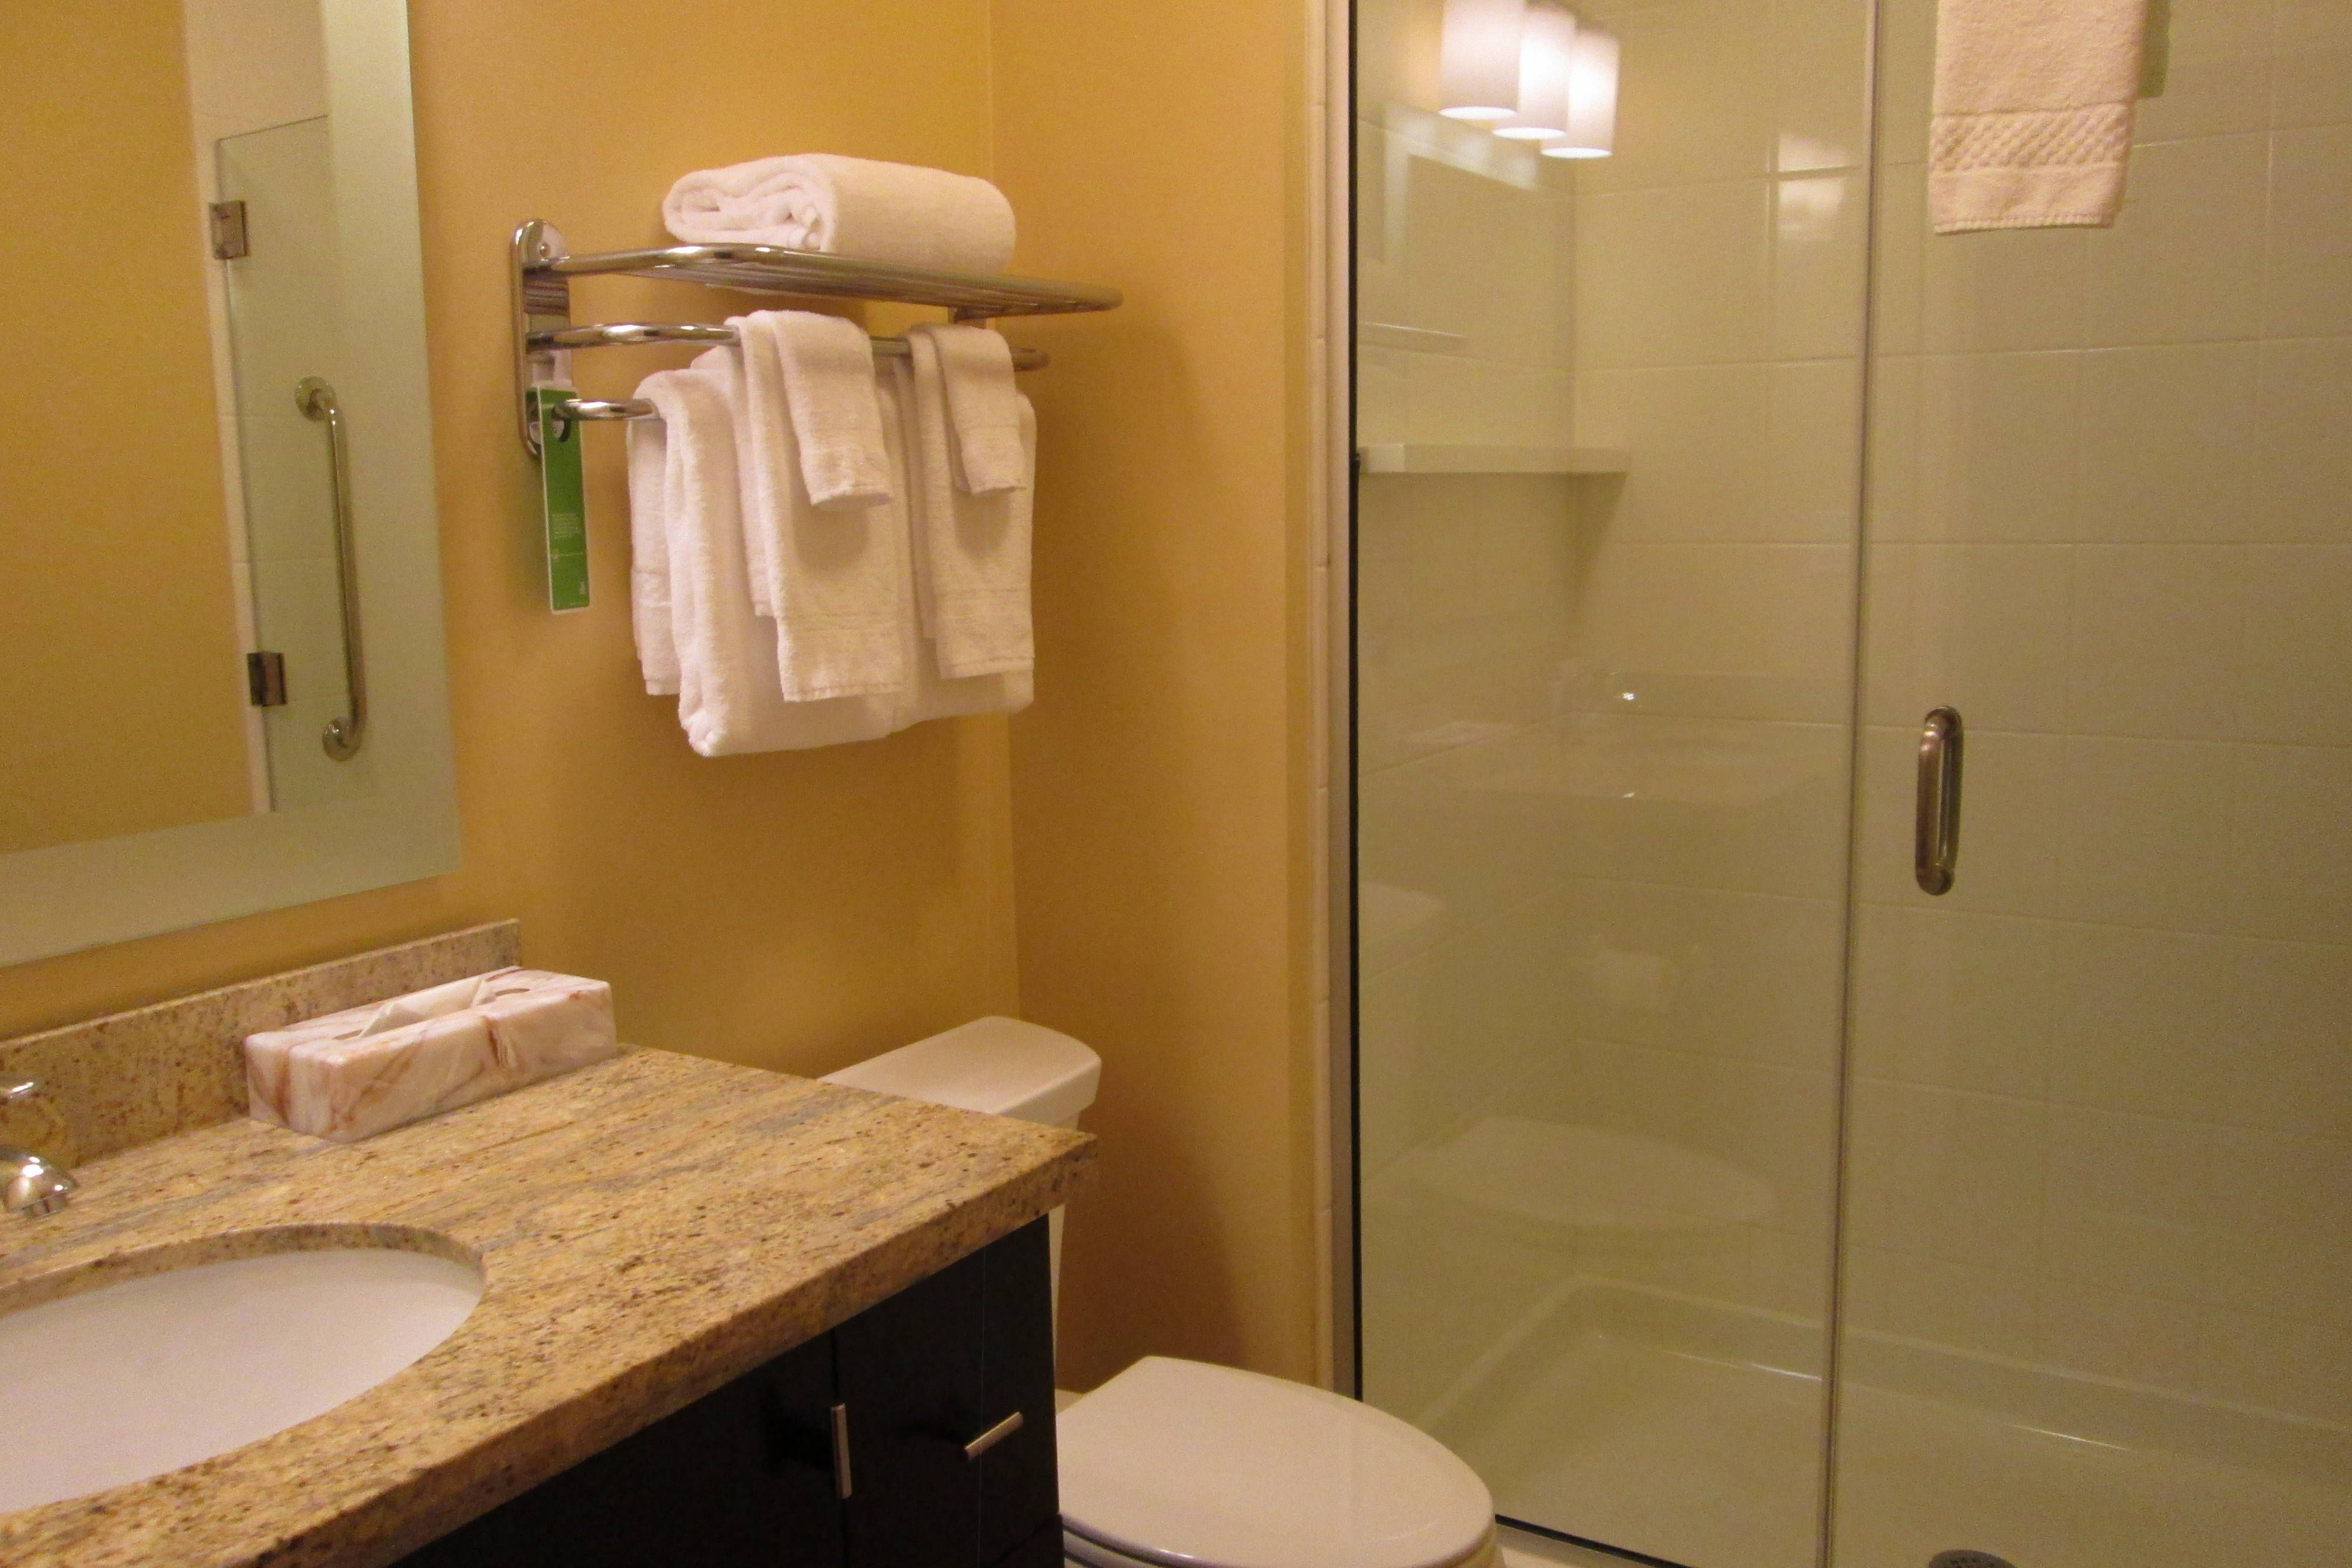 Towneplace Suites Williamsport Suite Bathroom Suite Guestroom Holiday Shower Shelves Suites Williamsport